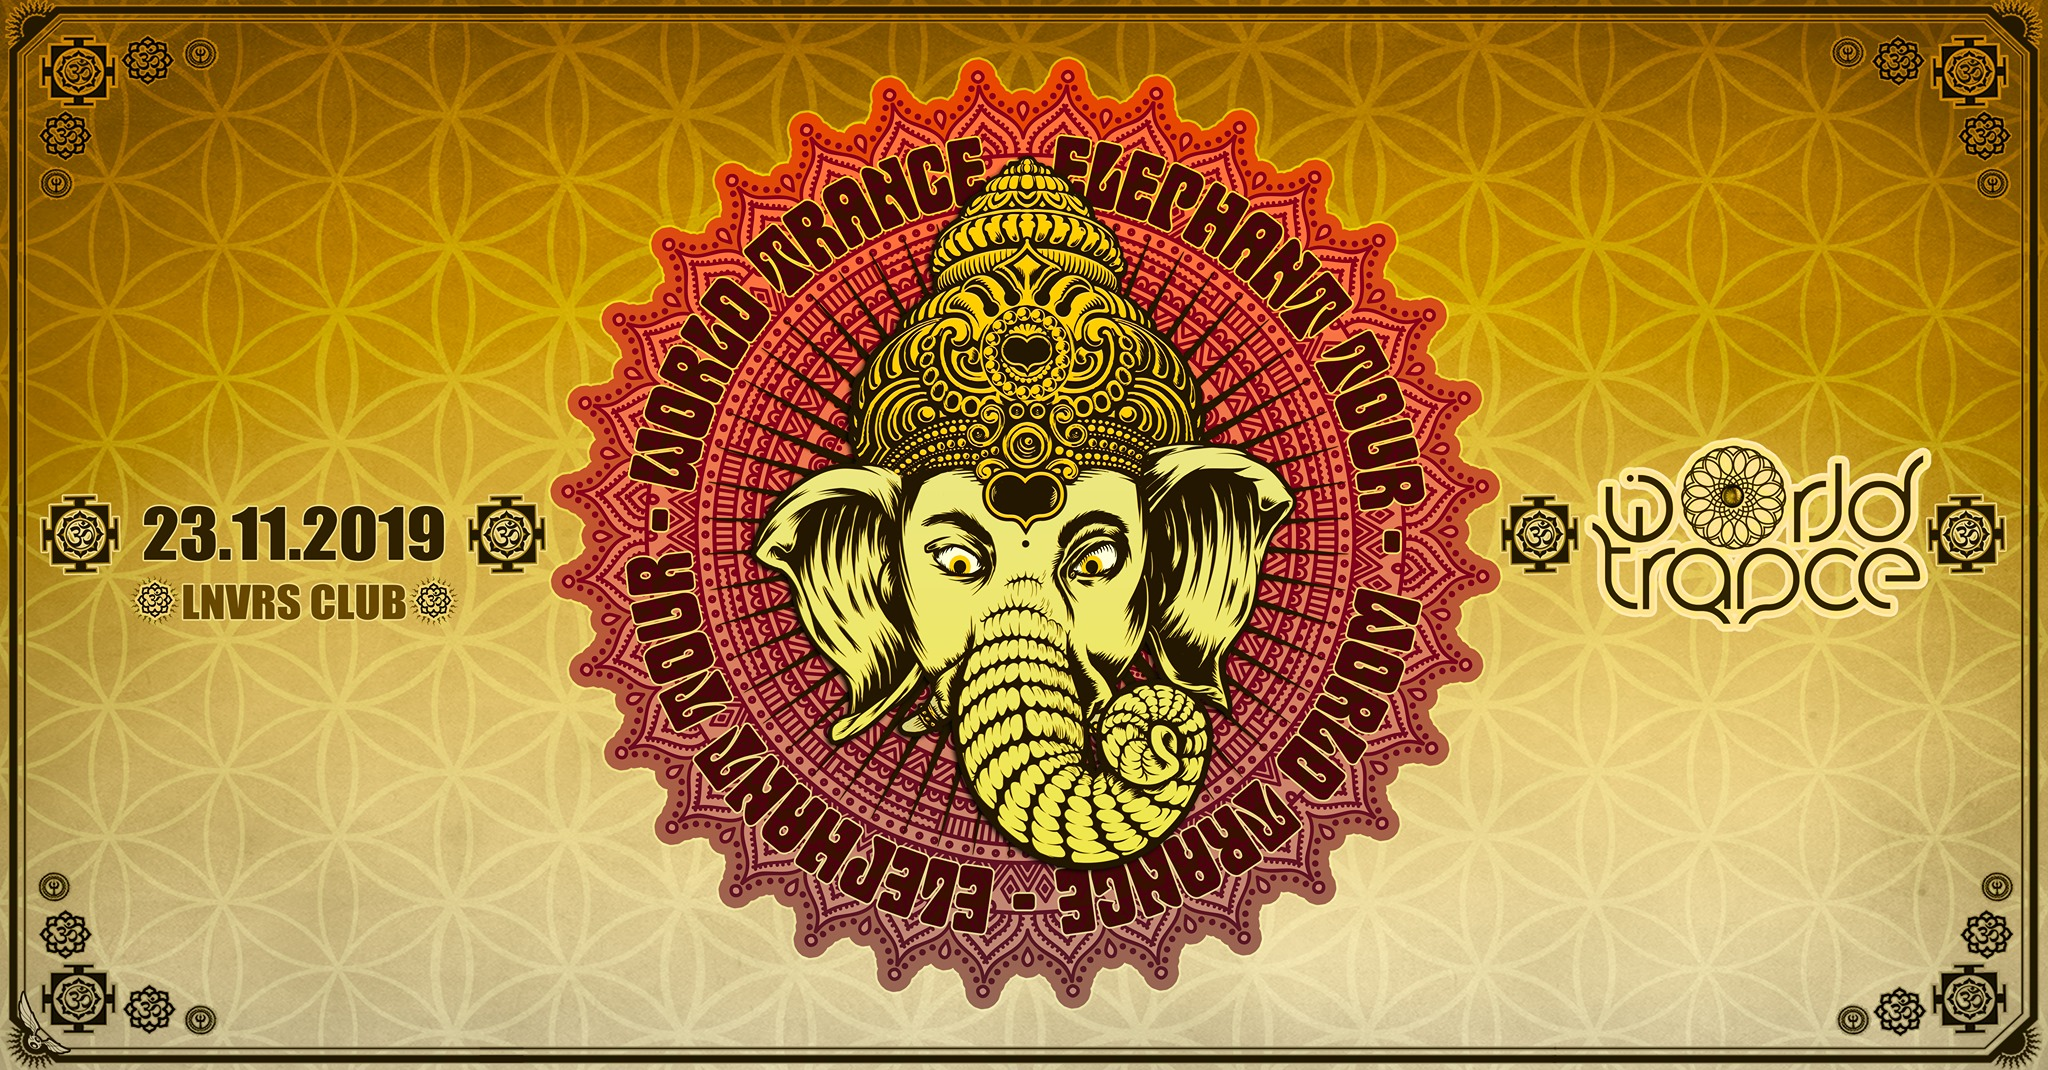 World Trance - Elephant Tour w/ Kalki, Unlogix LNVRS